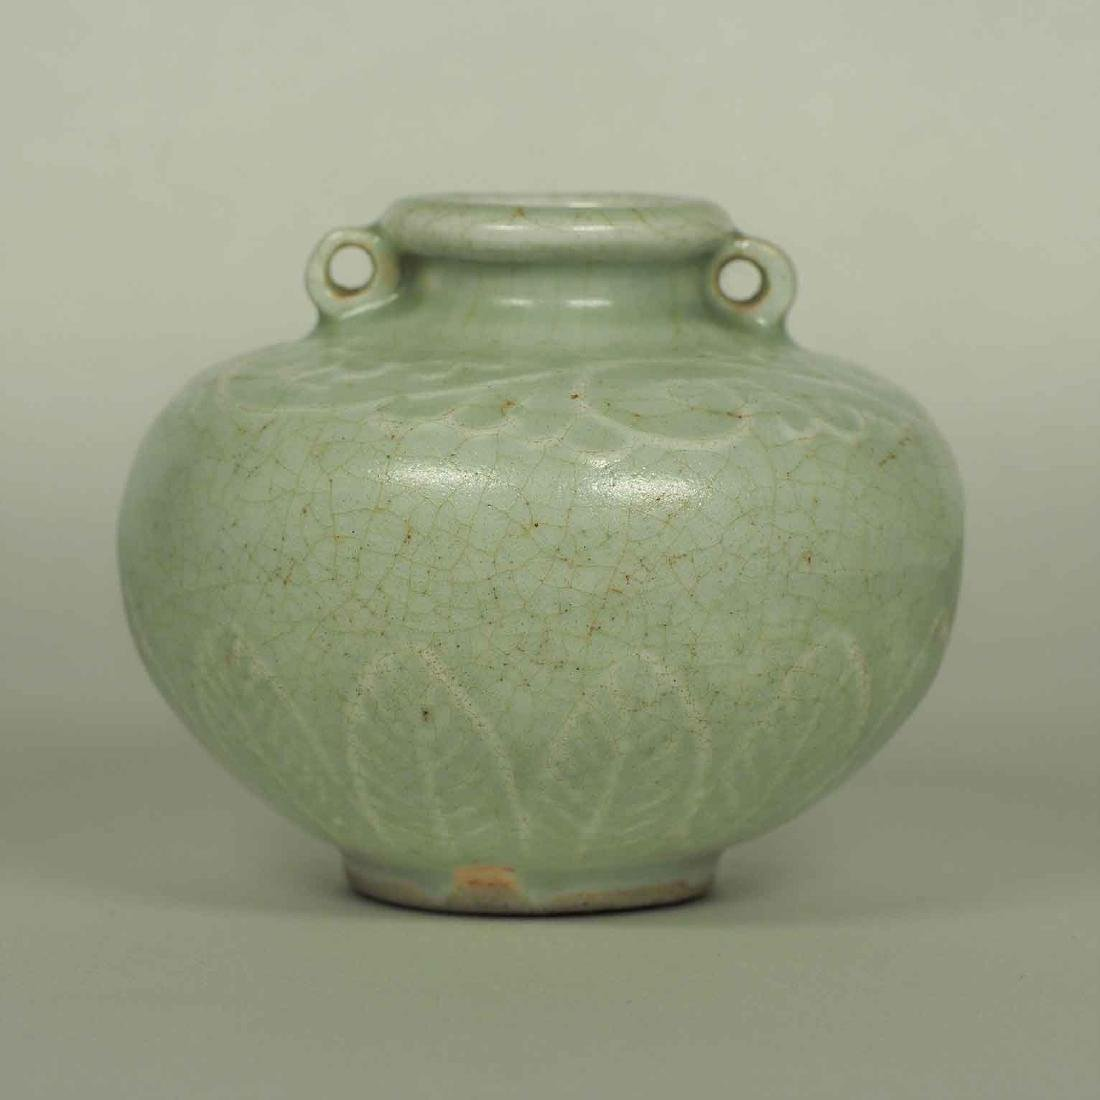 Longquan Crackled Jarlet, Yuan Dynasty